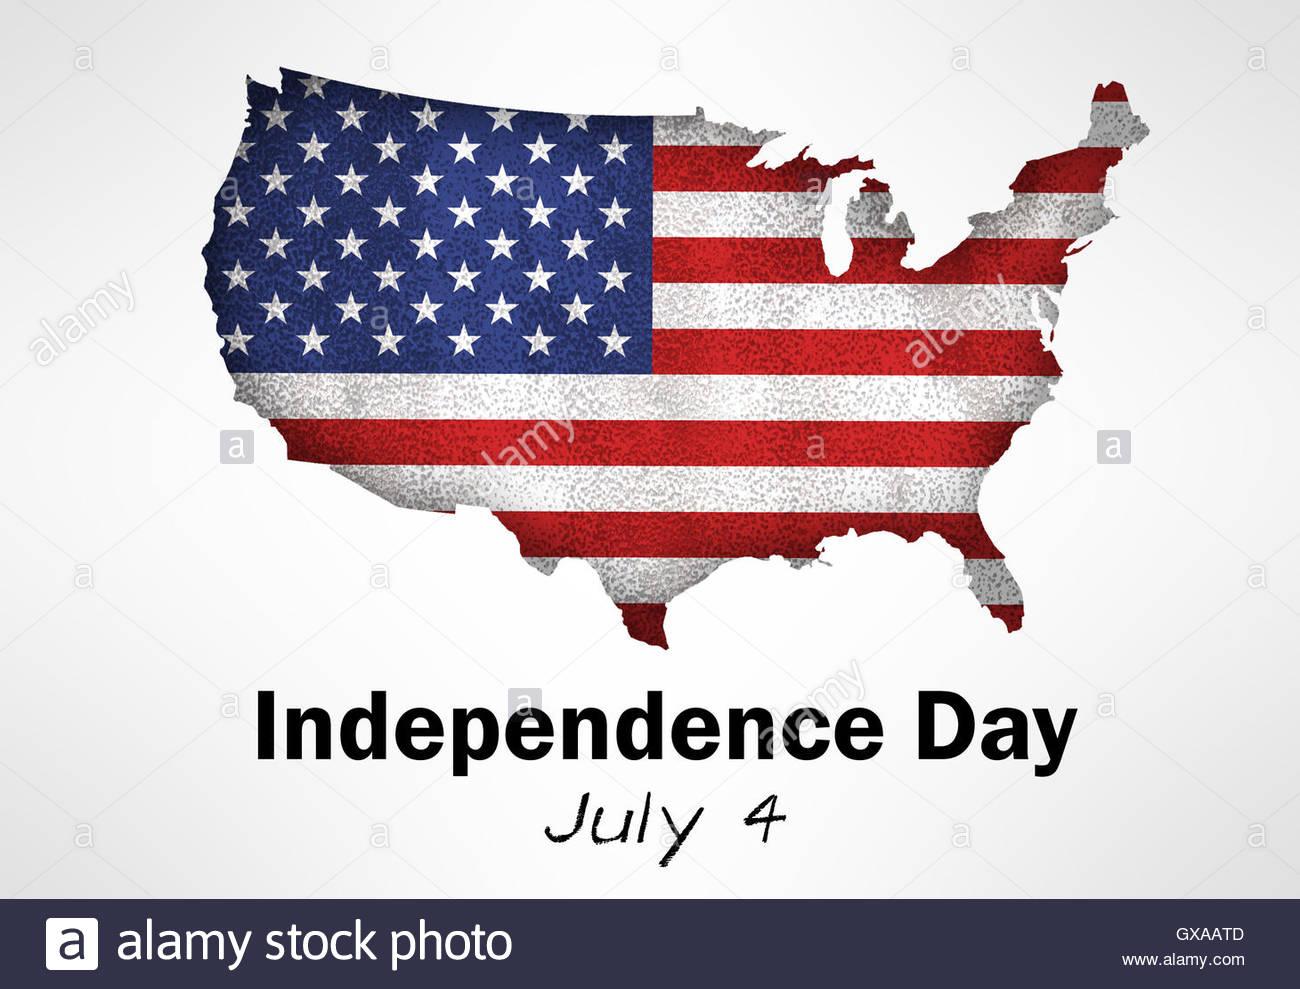 Independence Day - amerikanischen Feiertag Karte Flagge Abbildung Stockbild